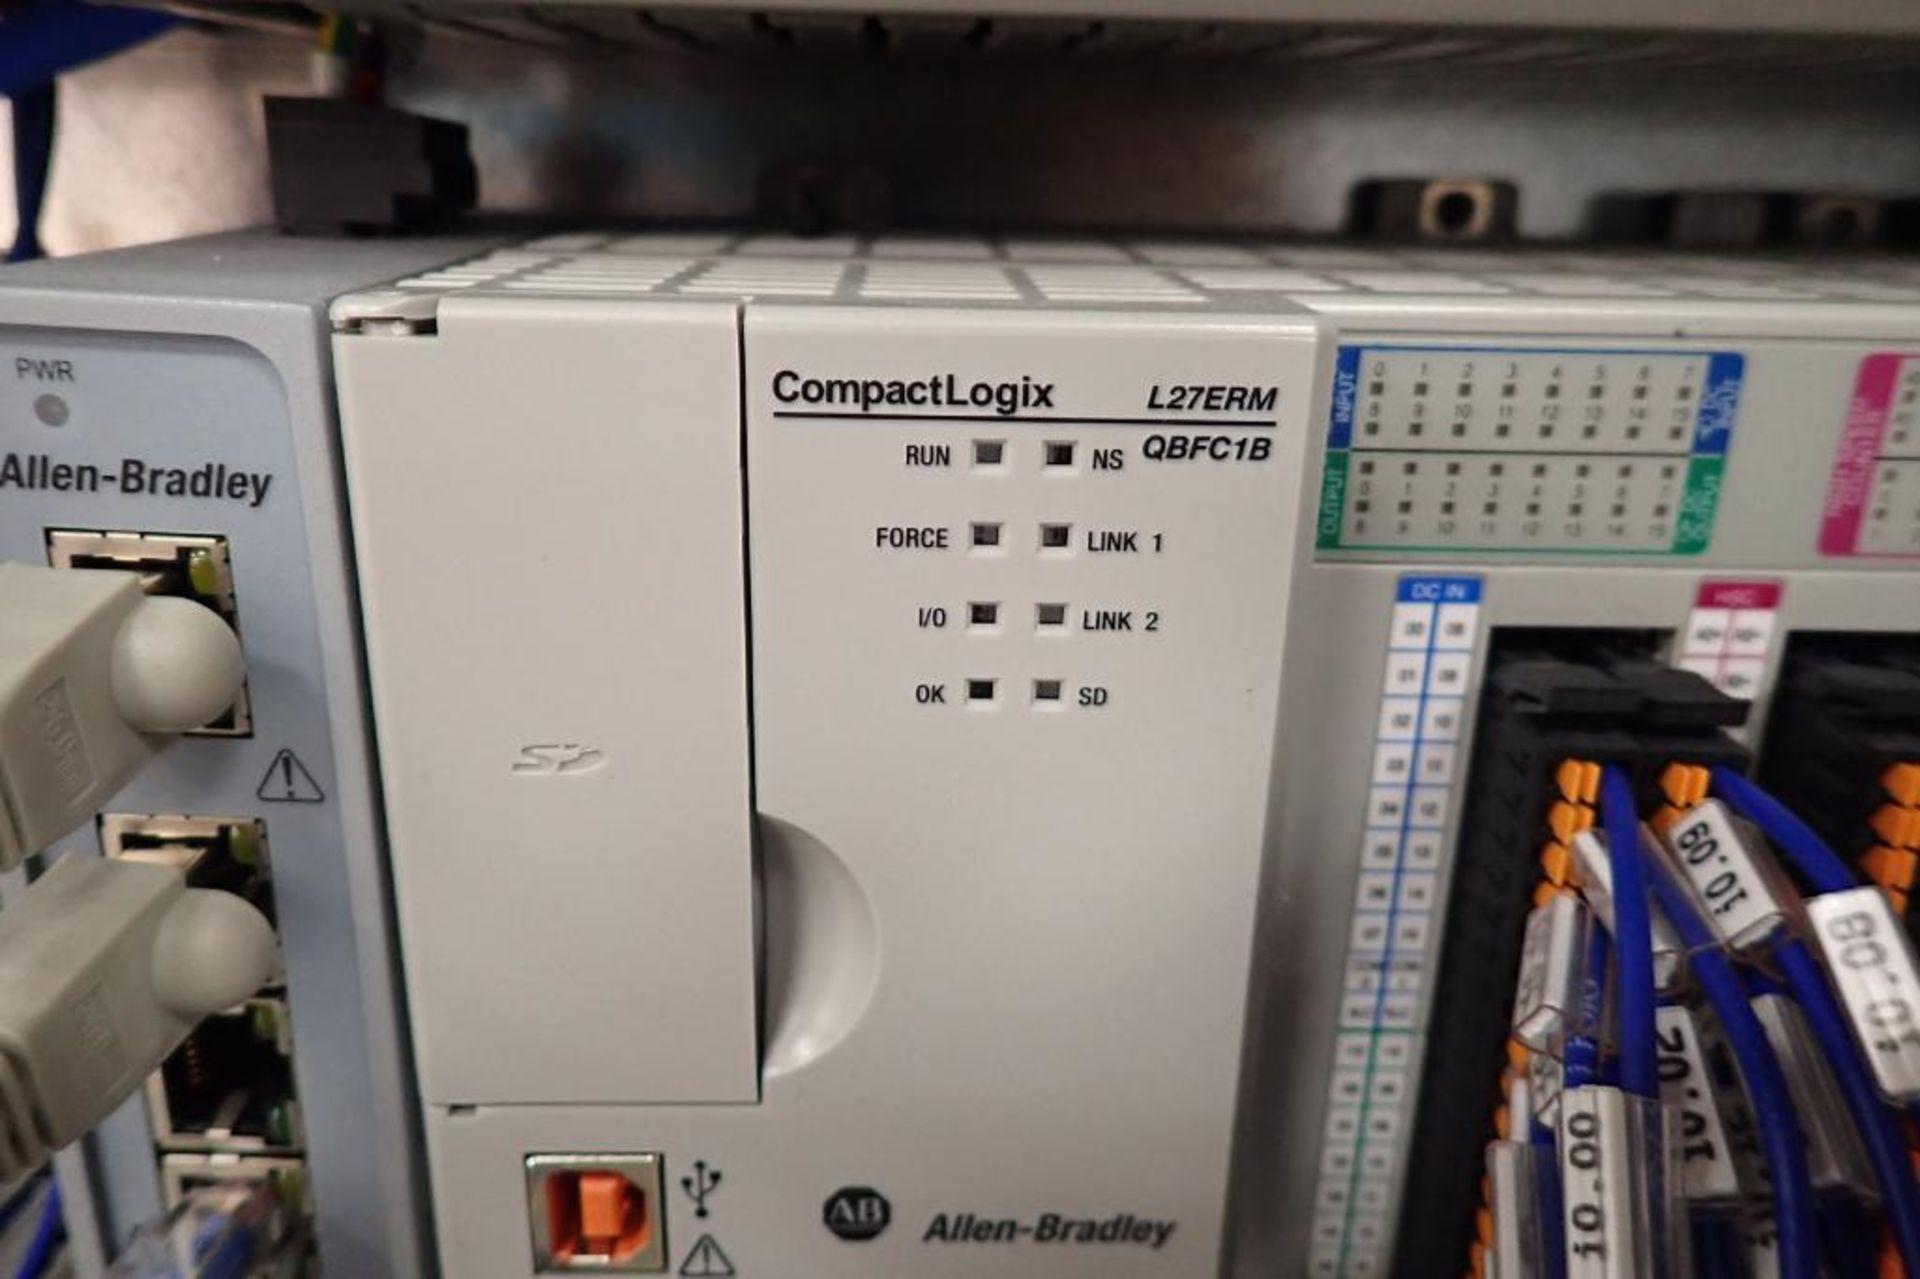 Lot 5 - 2015 Comec pad printing machine, Model KE166CE130, SN 10617, 6 spot, Allen Bradley panelview plus